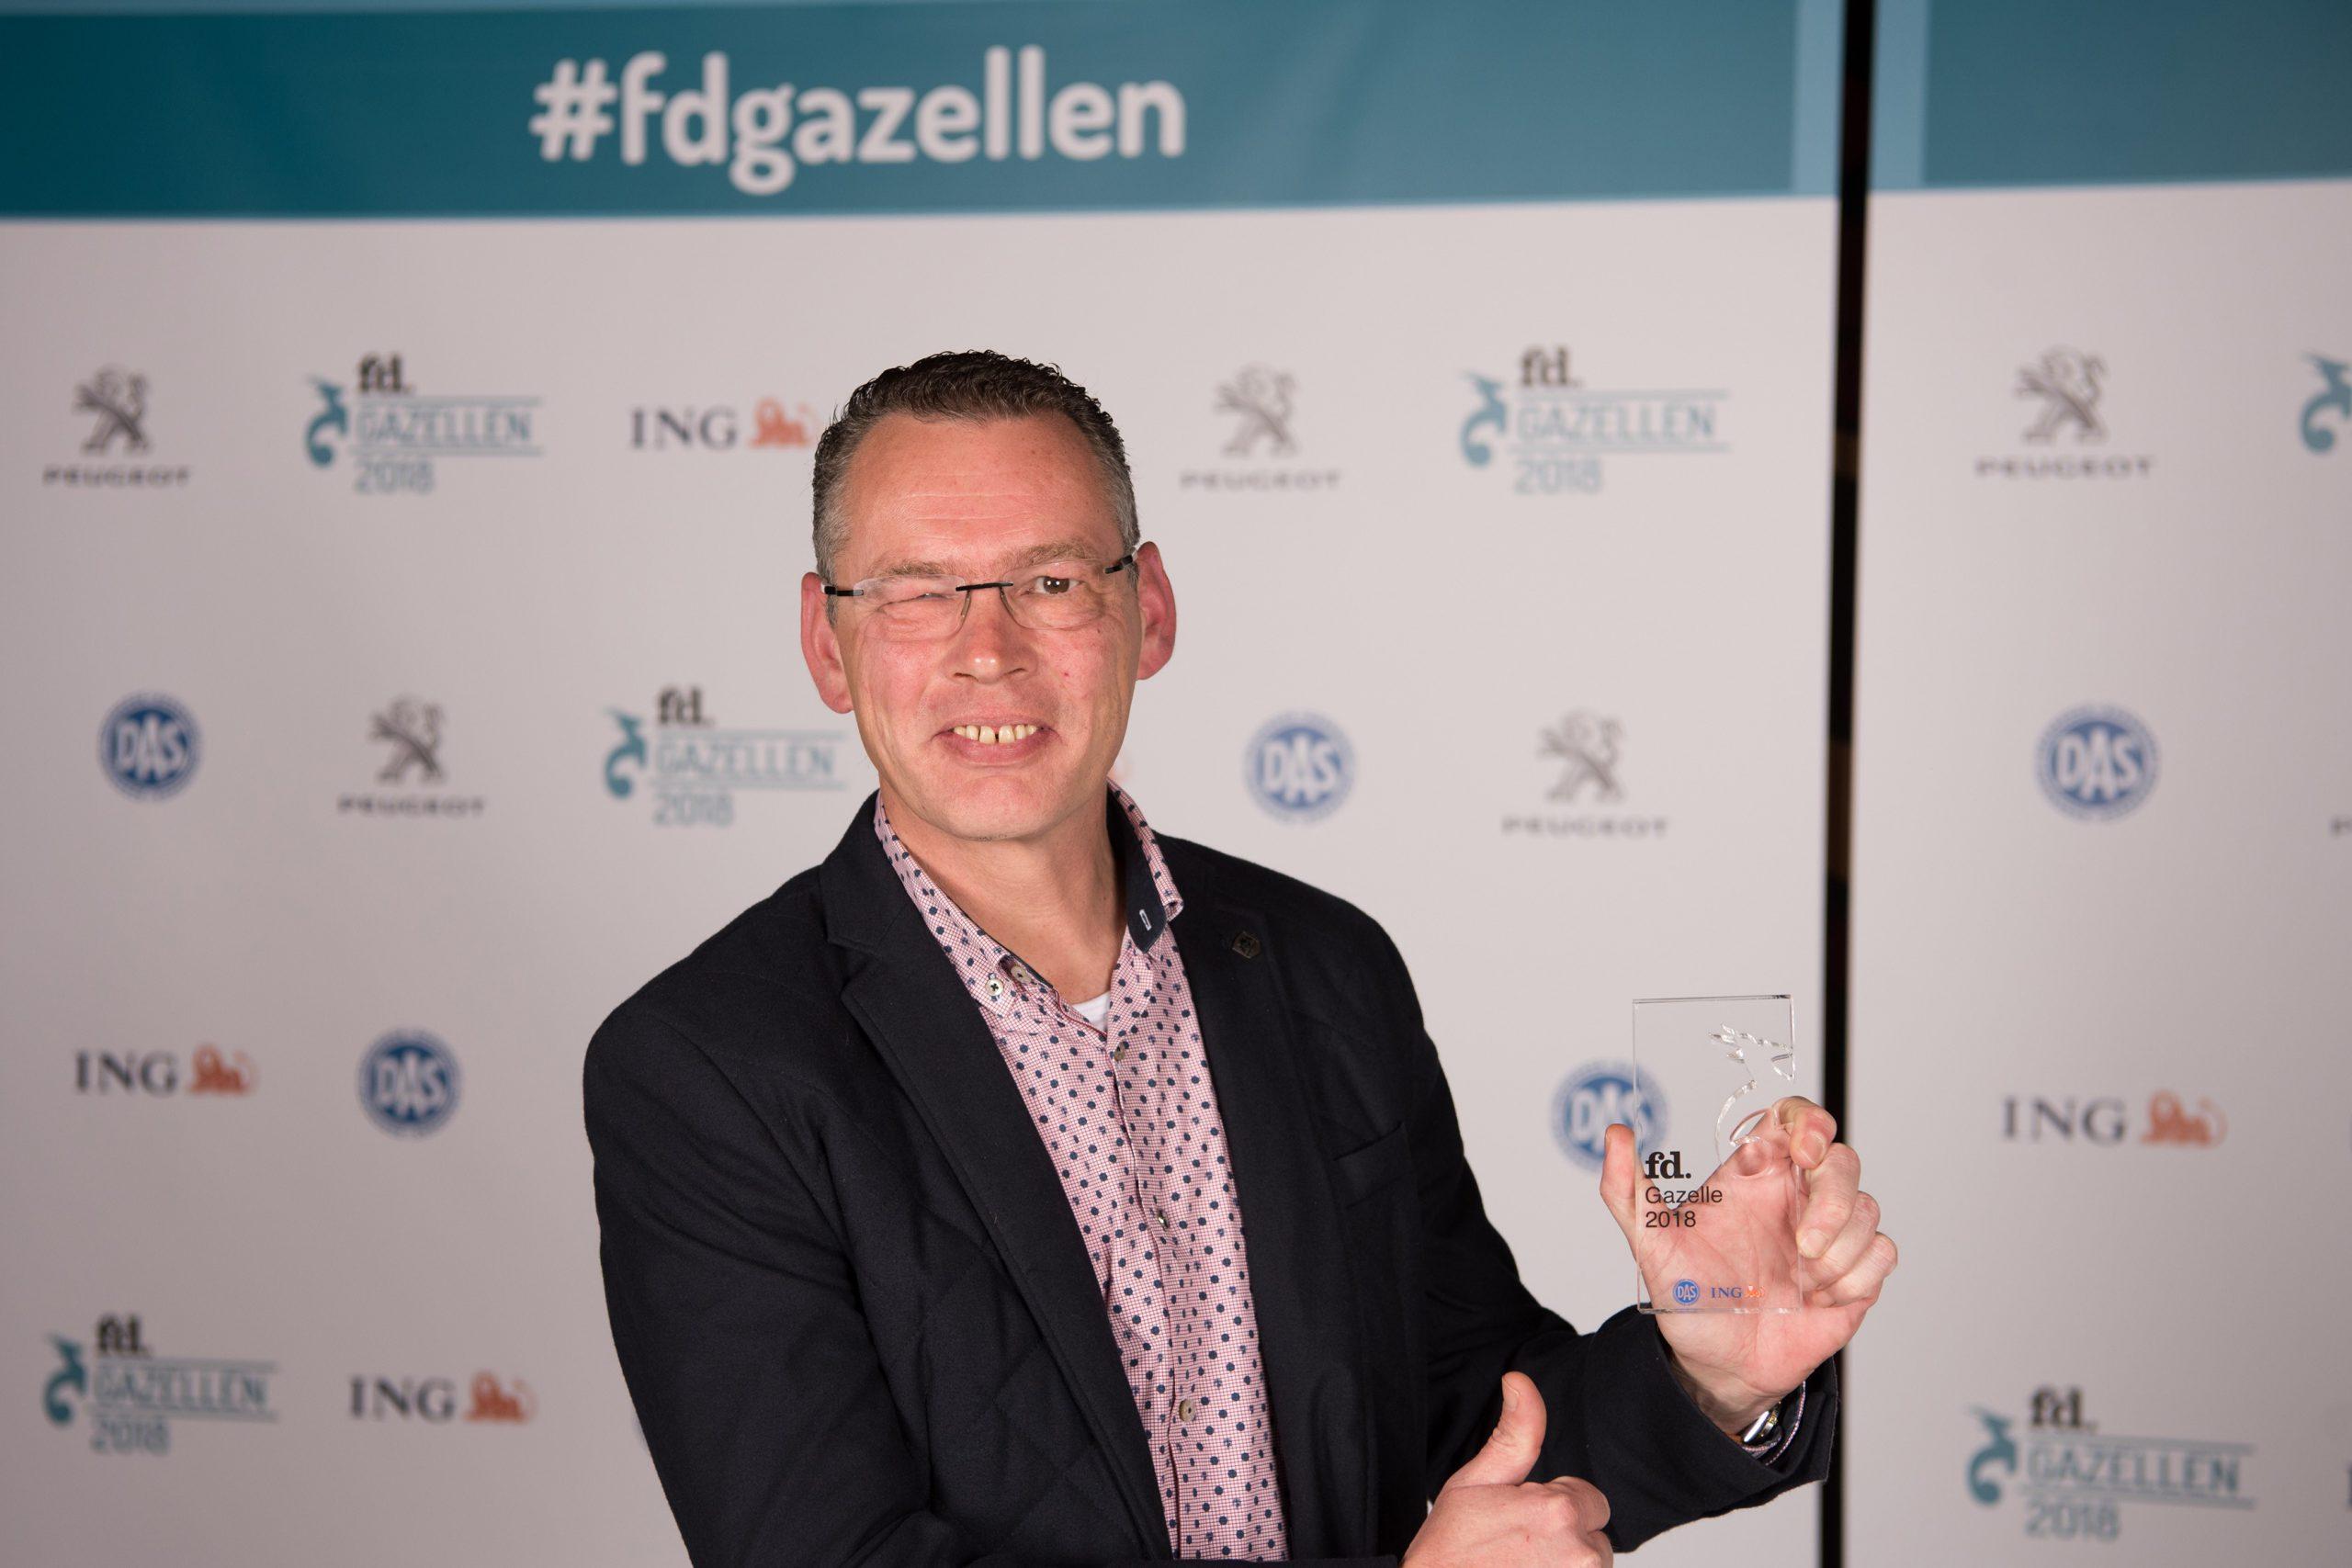 FD Gazelle Award SucceedIT